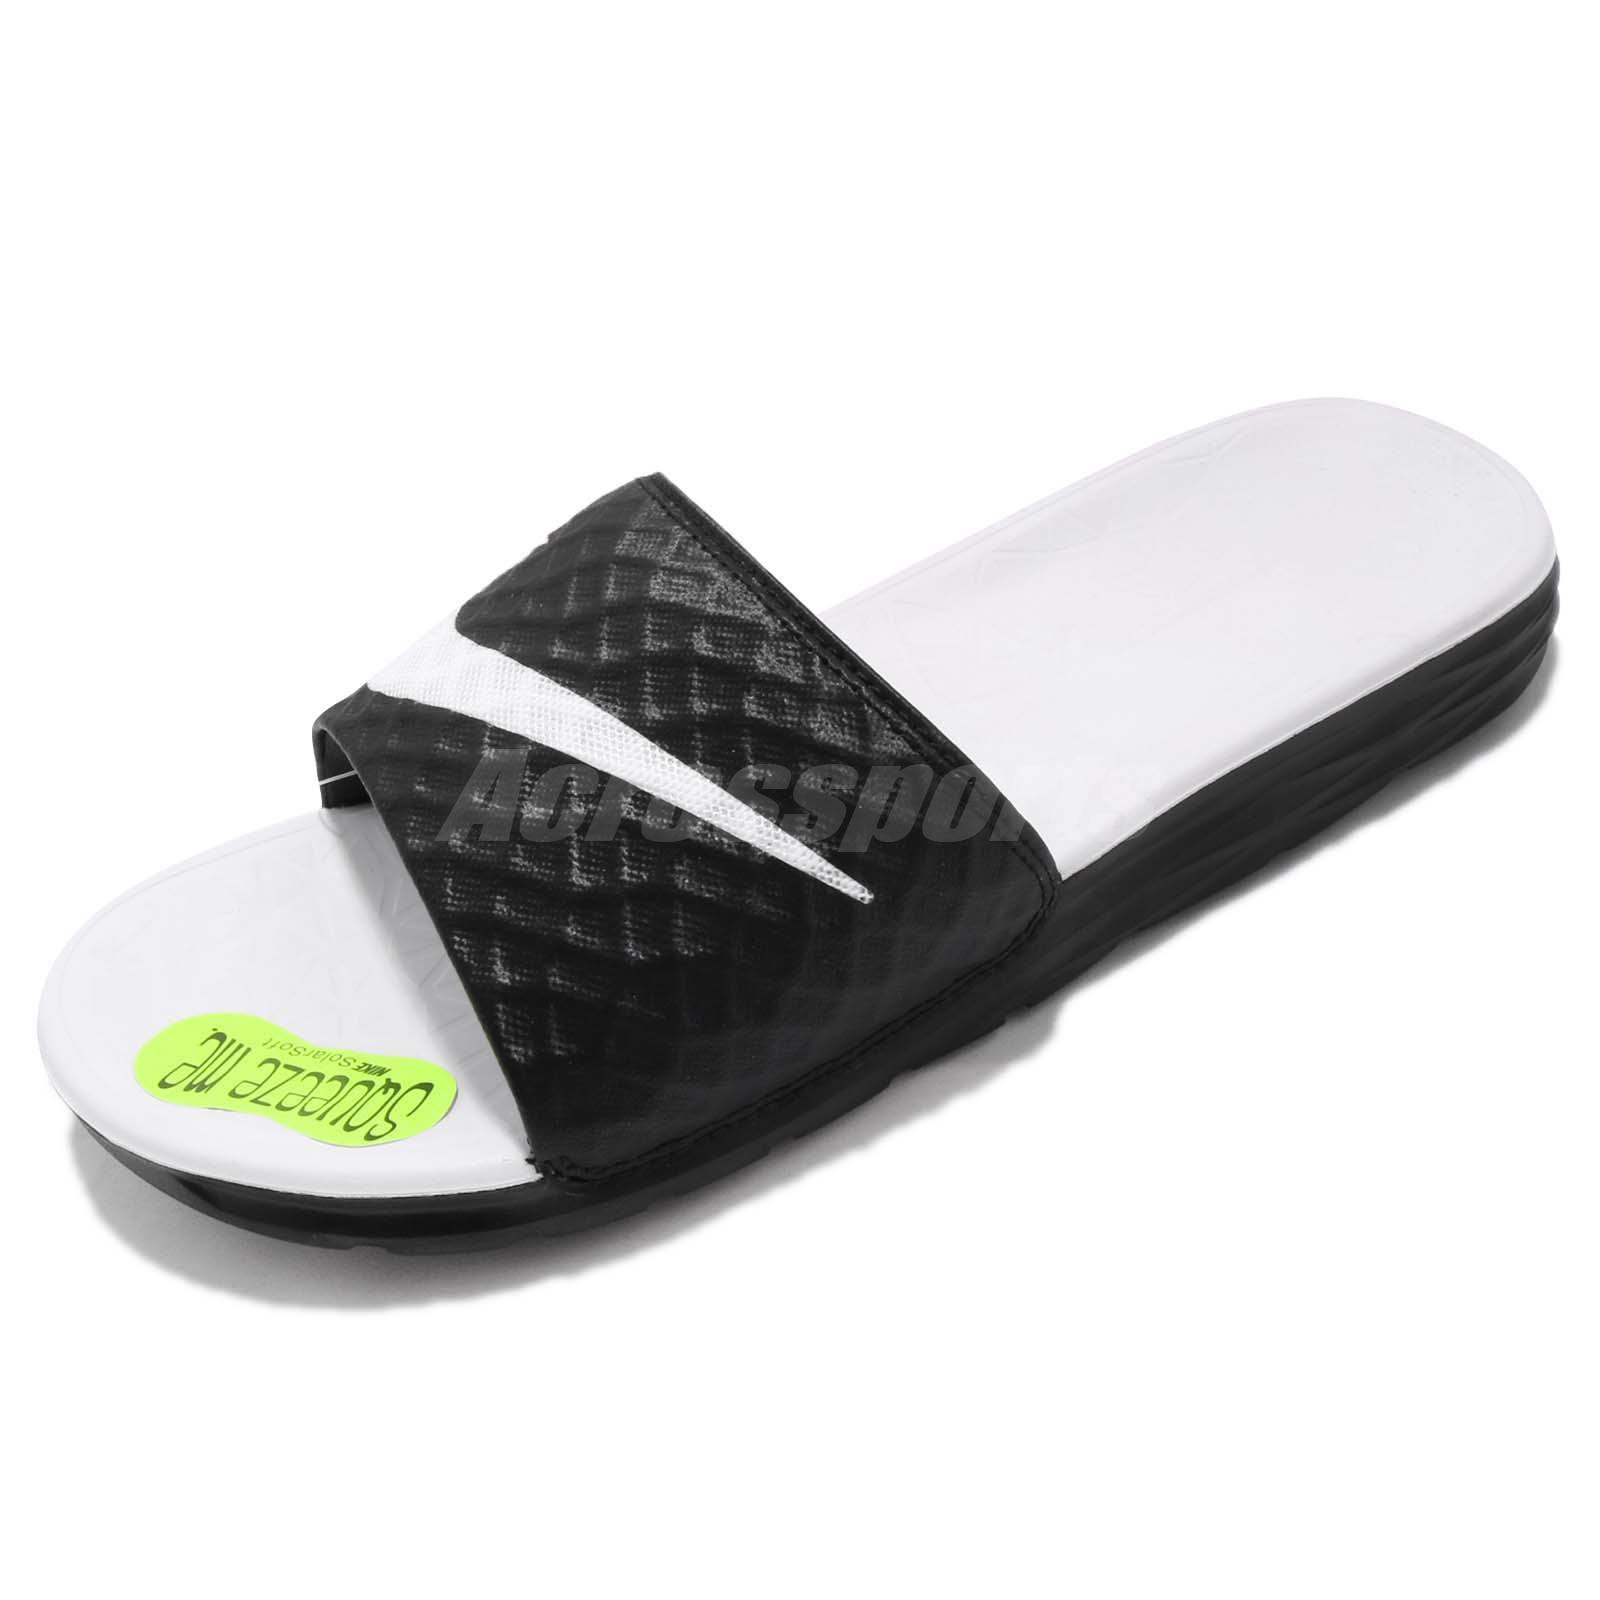 new arrival a19d1 343eb Wmns Nike Benassi Solarsoft White Black Womens Slippers Sandal Slides  705475-010